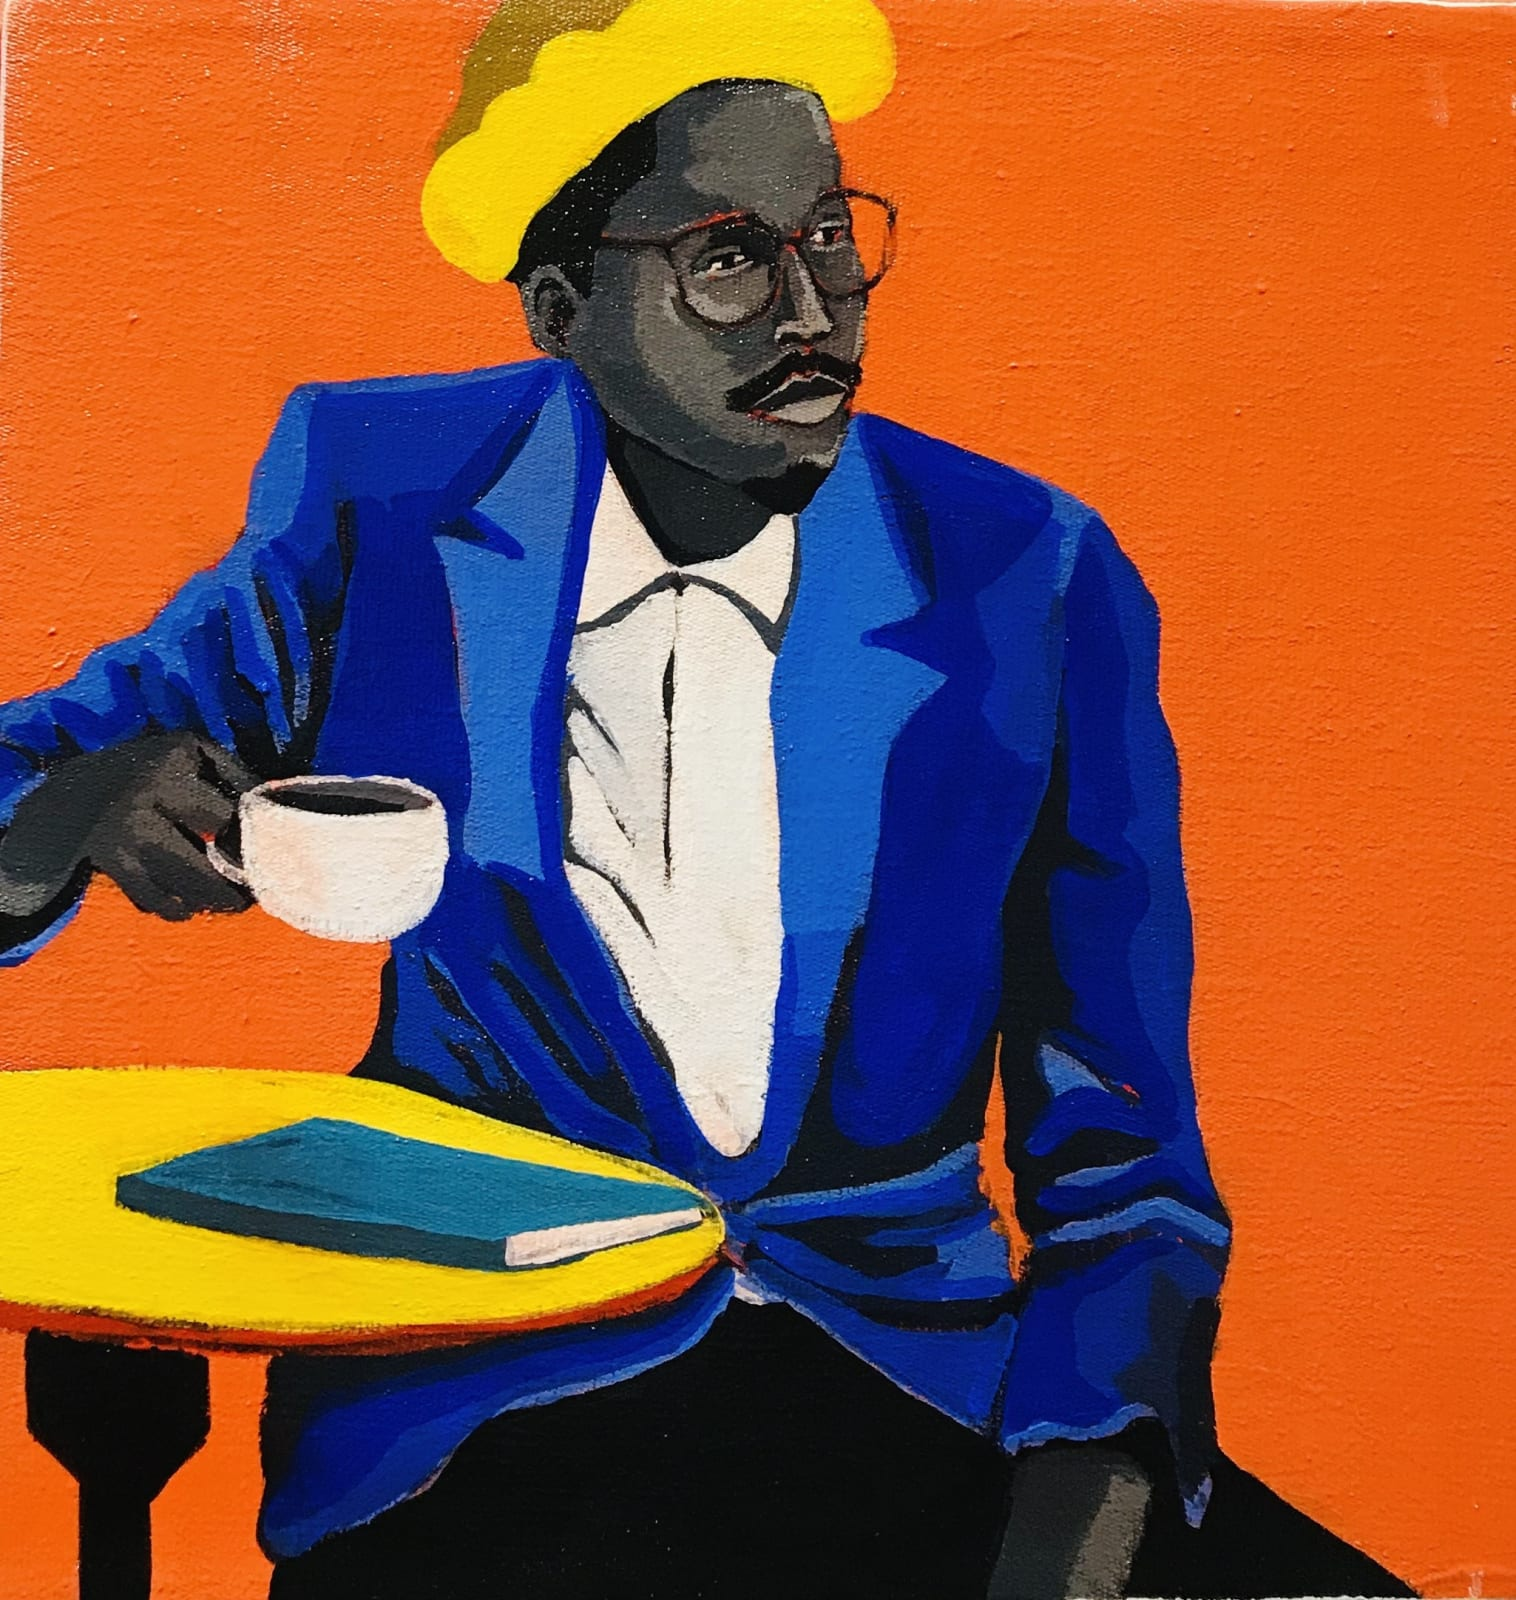 Mwana Wevhu (Son of the Soil) | Tafadzwa Tega